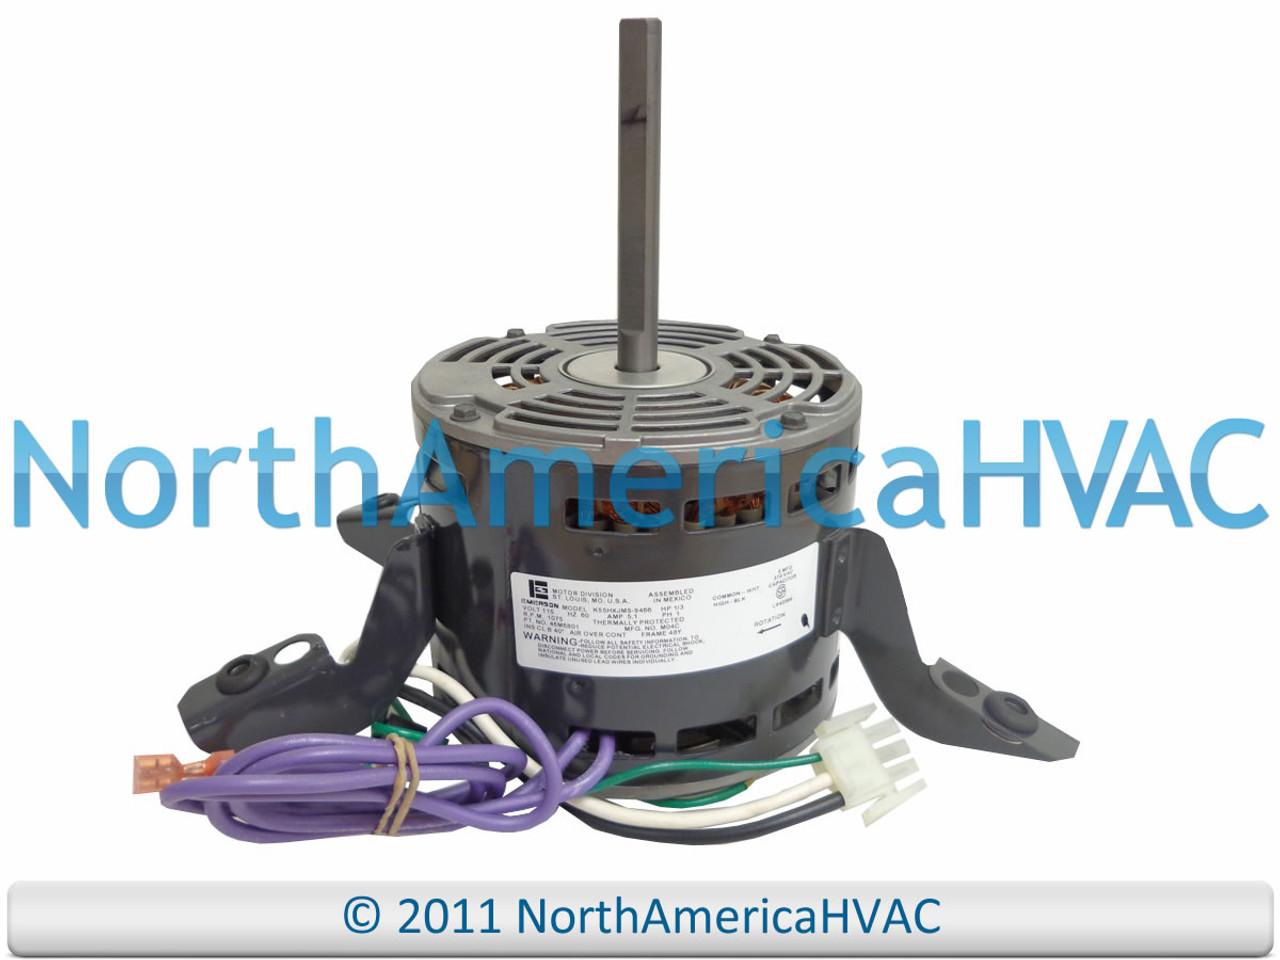 OEM Lennox Armstrong 1/3 HP 115 Furnace BLOWER MOTOR K55HXJMS-9466 46M68  46M6801 - North America HVACNorth America HVAC